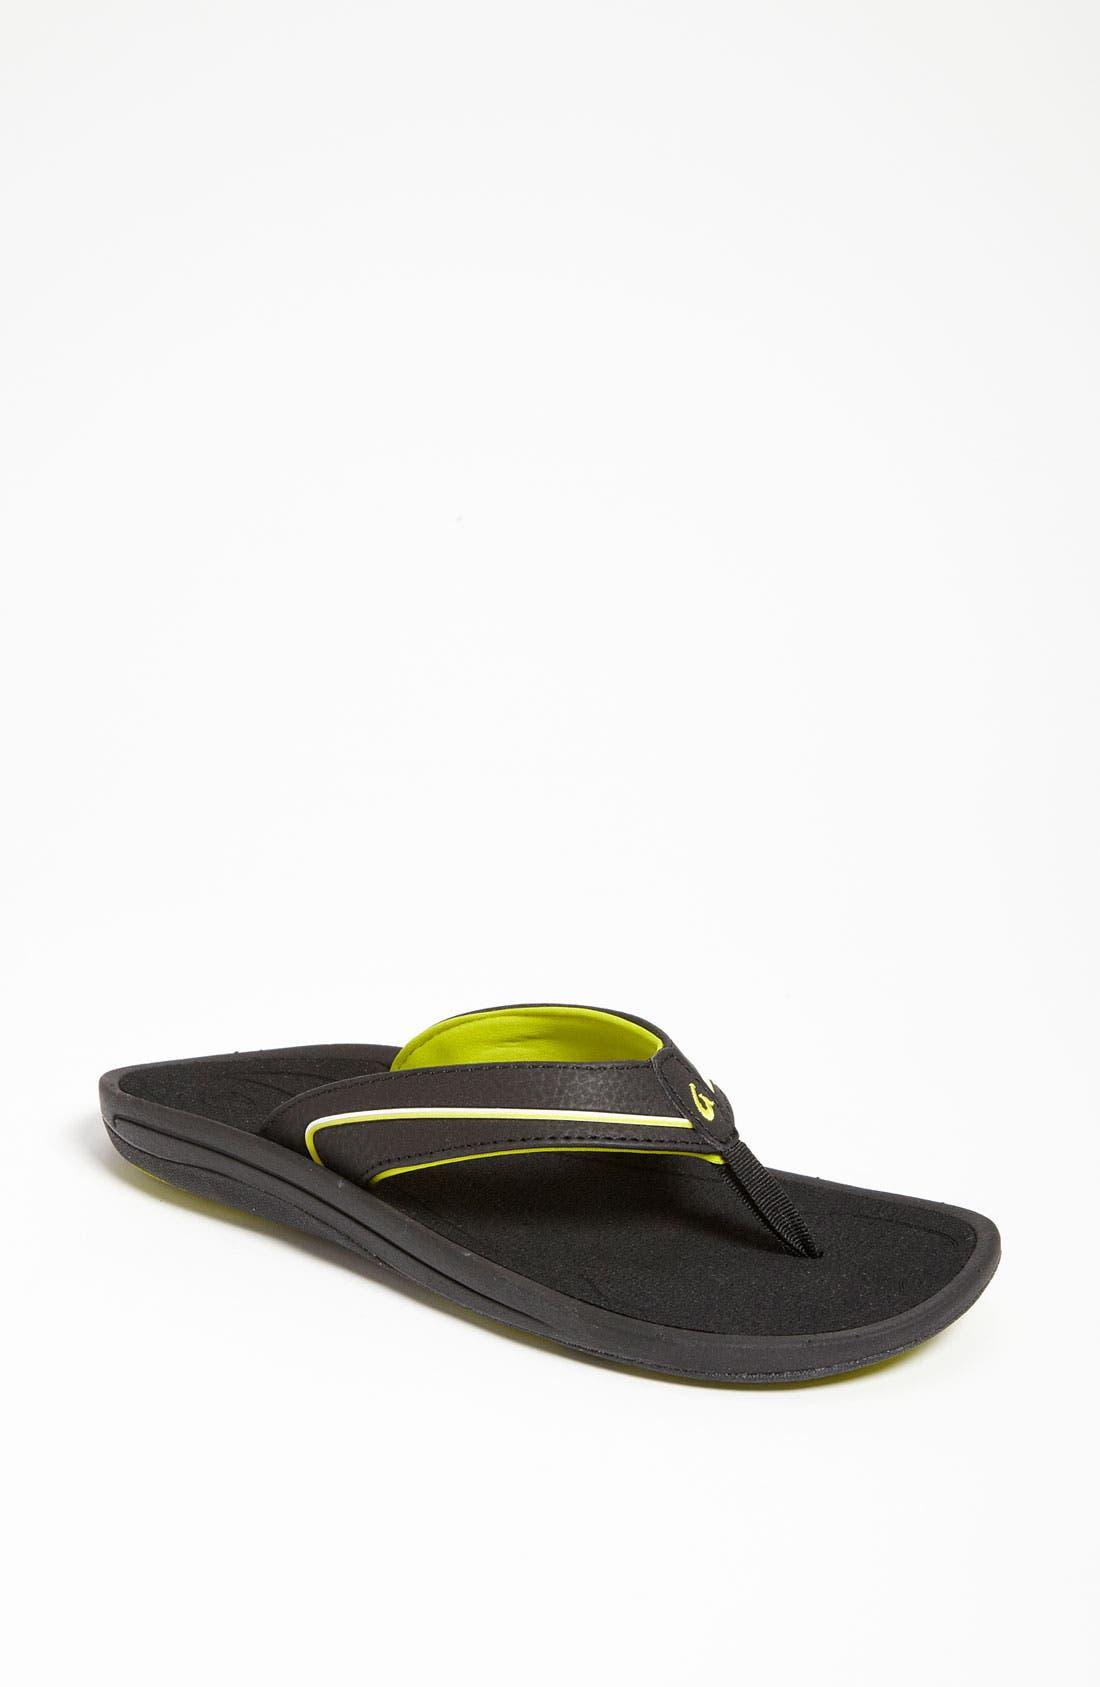 Main Image - OluKai 'Lele' Flip Flop